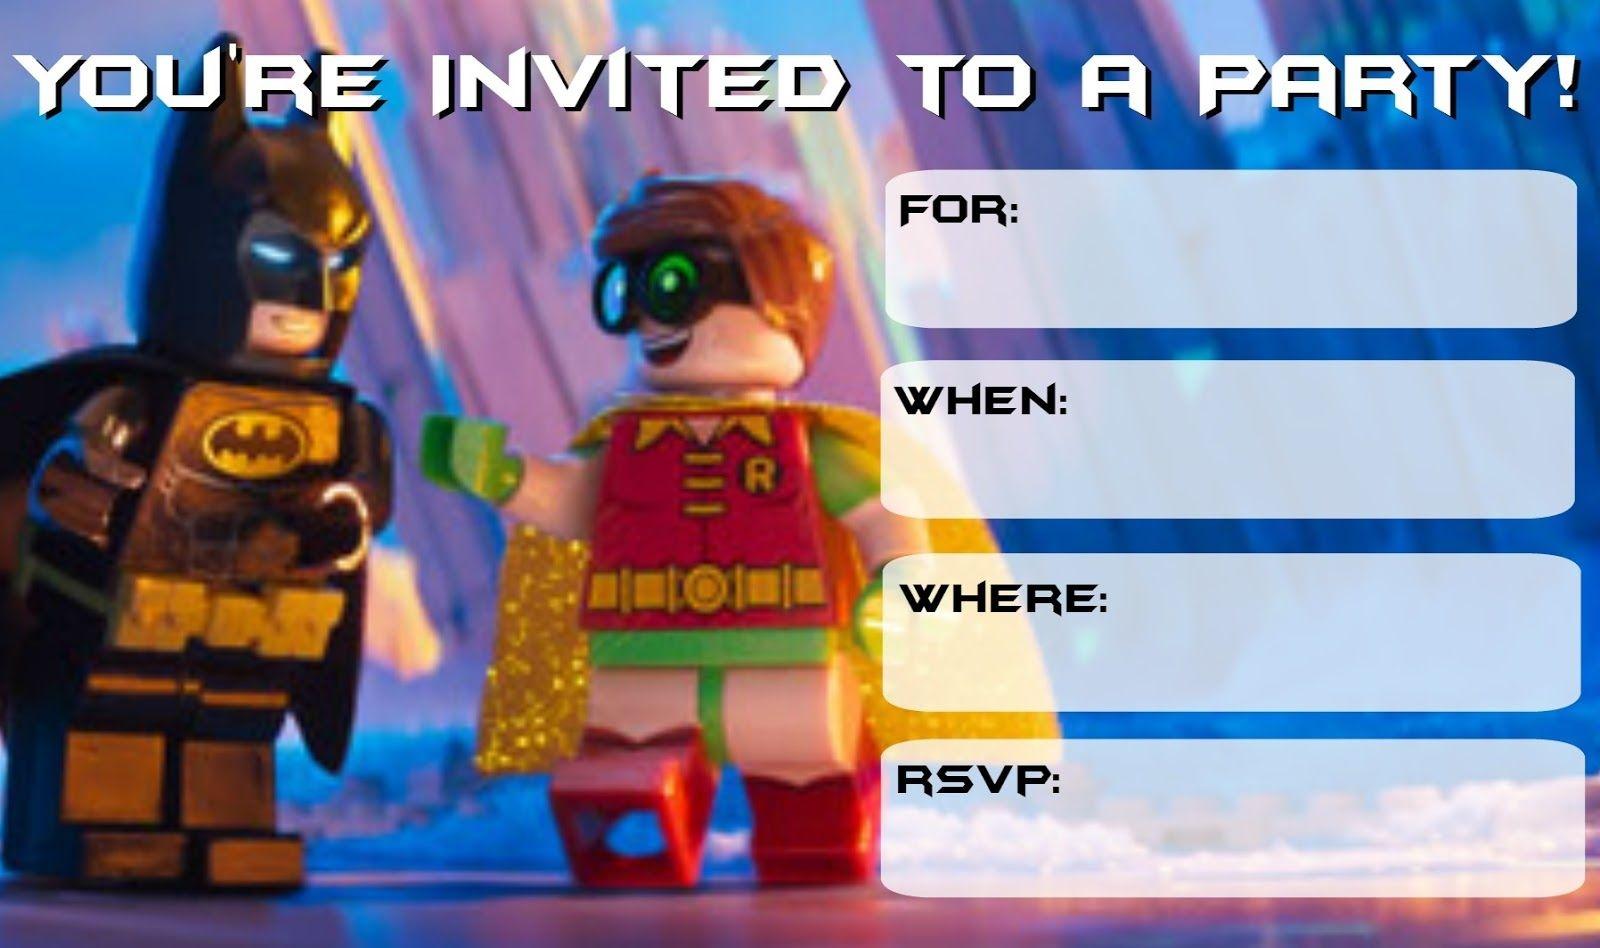 More Lego Batman Party Invitations | Drew's Birthday | Lego Batman - Lego Batman Invitations Free Printable